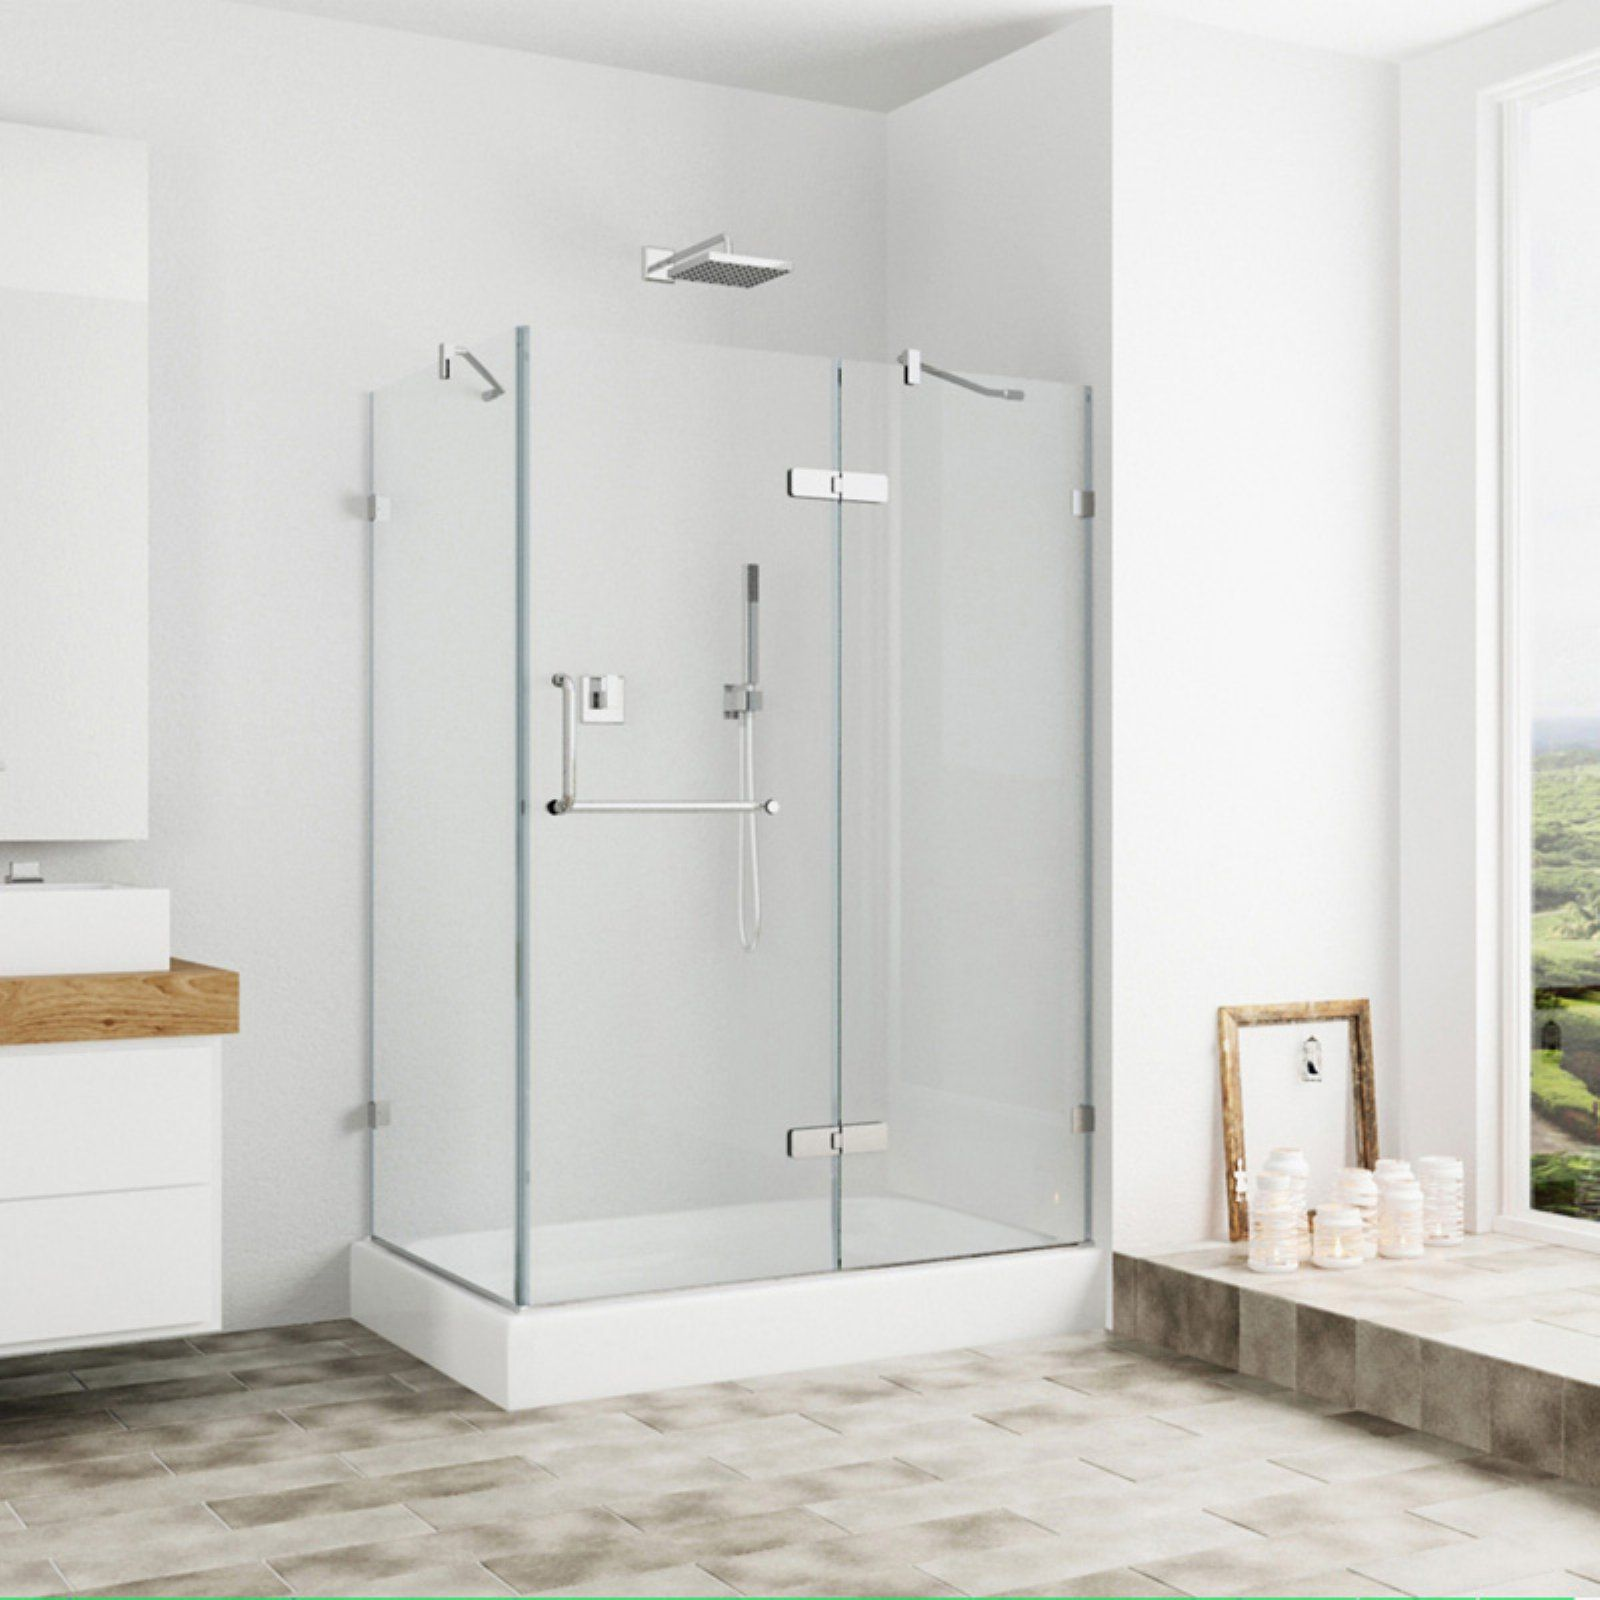 Vigo Vg601140w 40 25w X 79 21h In Clear Glass Shower Enclosure